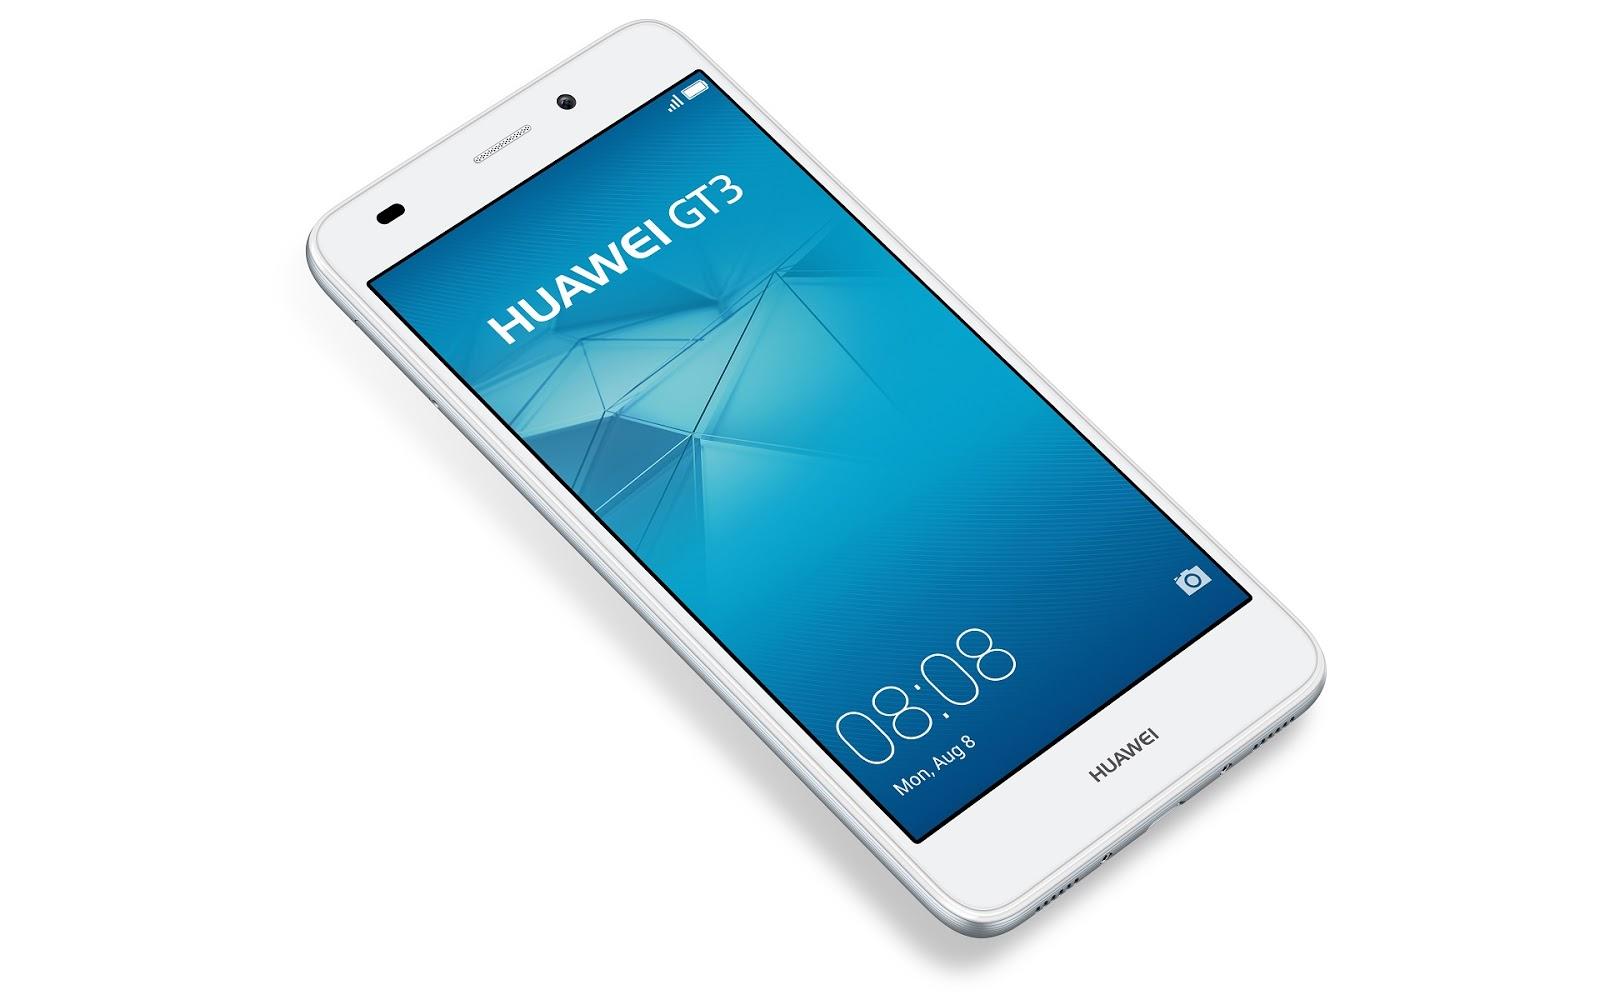 Come aggiungere Widget su Huawei GT3